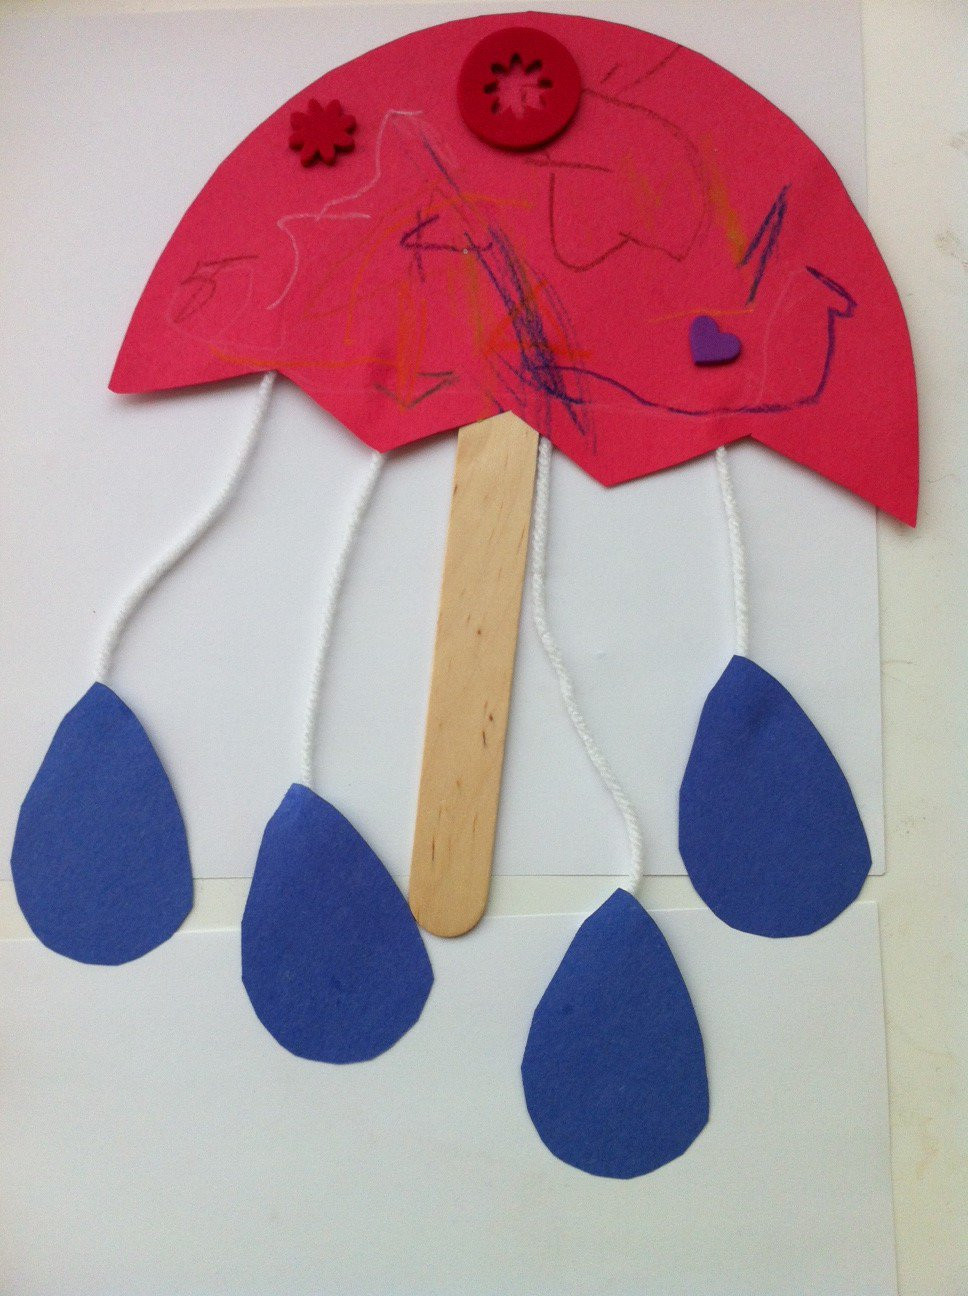 Best ideas about Preschool Art Projects . Save or Pin Letter U Crafts Preschool and Kindergarten Now.